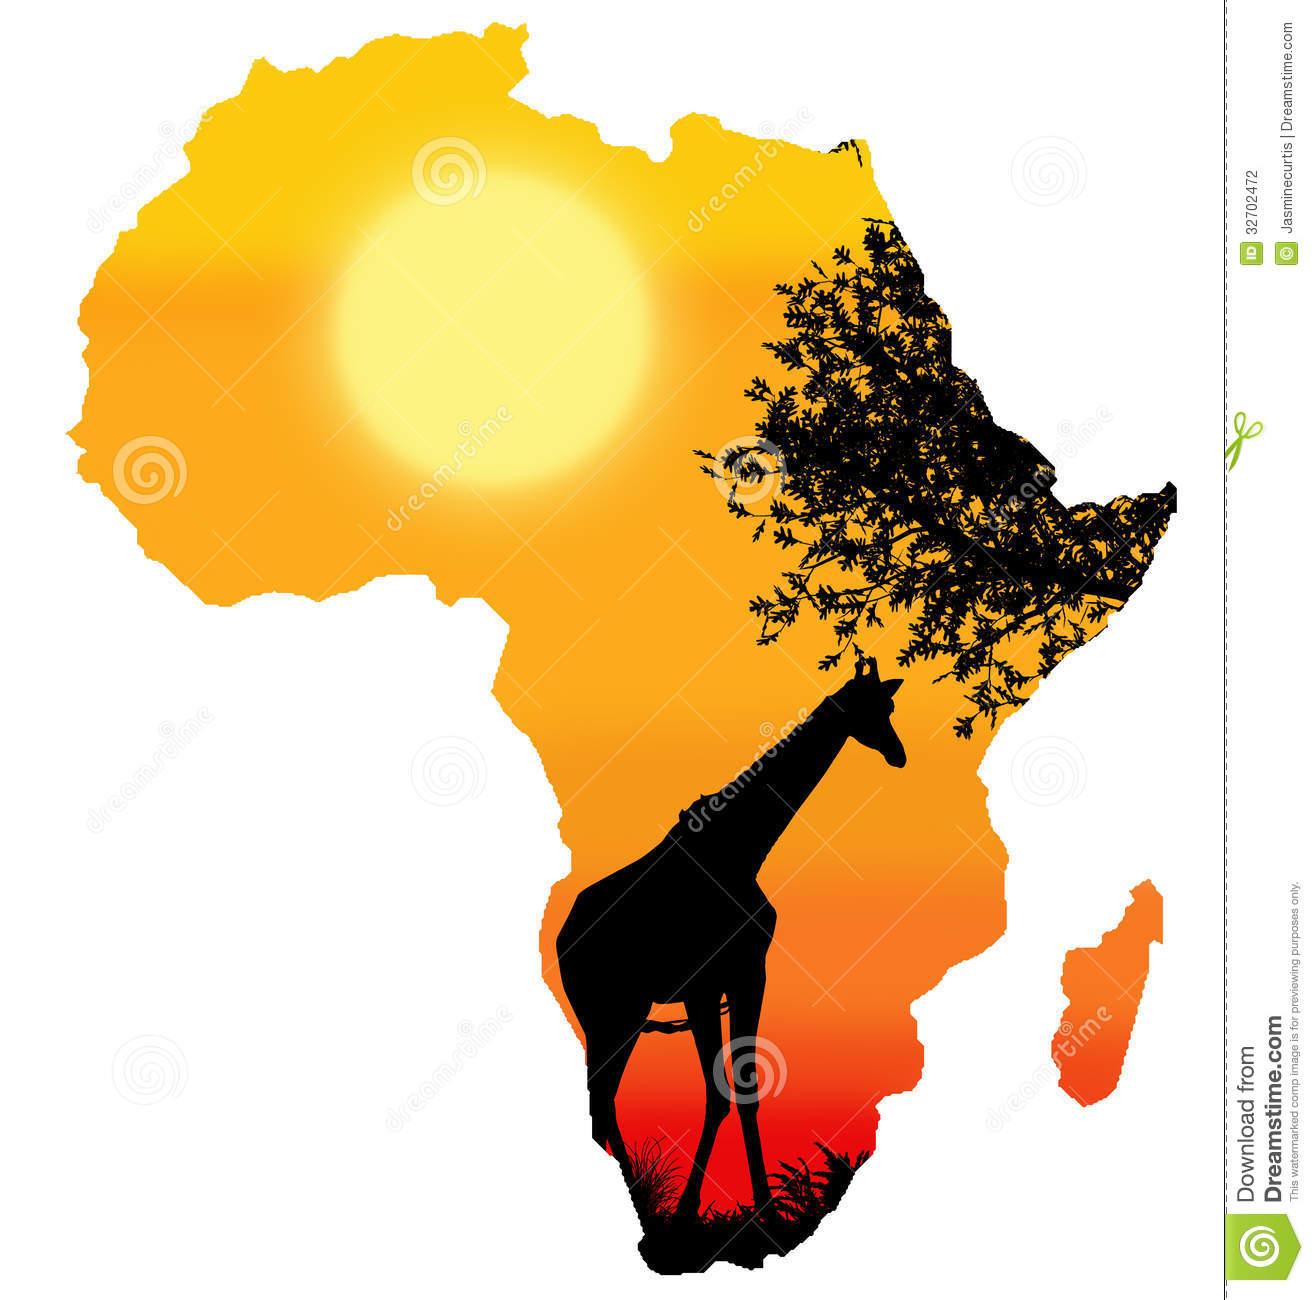 Africa Clipart Africa Safari Silhouette